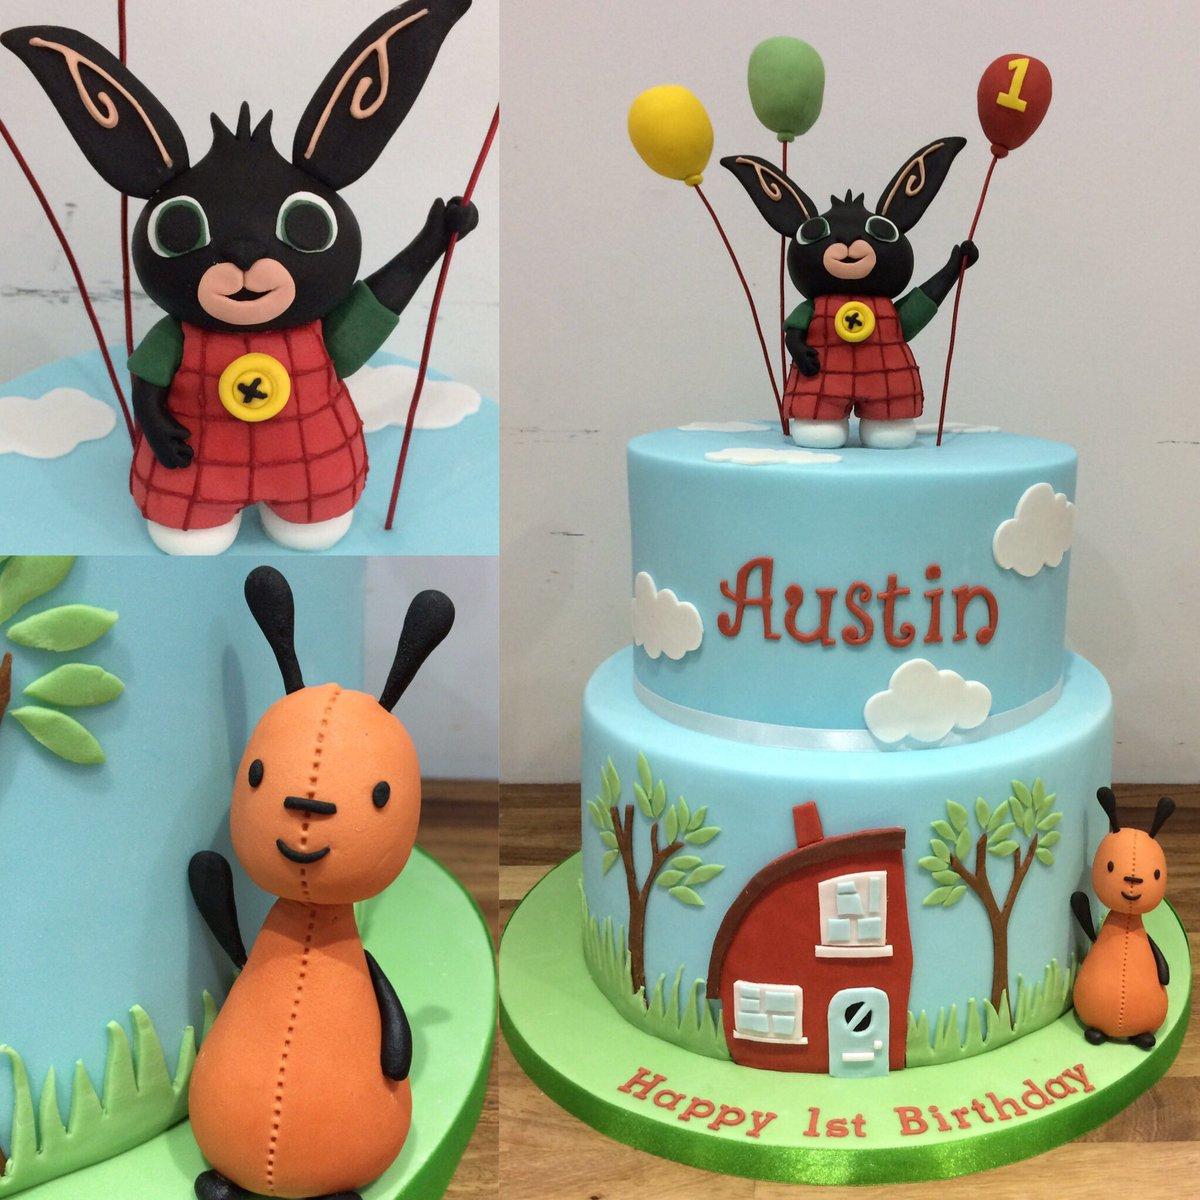 Victorias Cake Co victoriascakeco Twitter